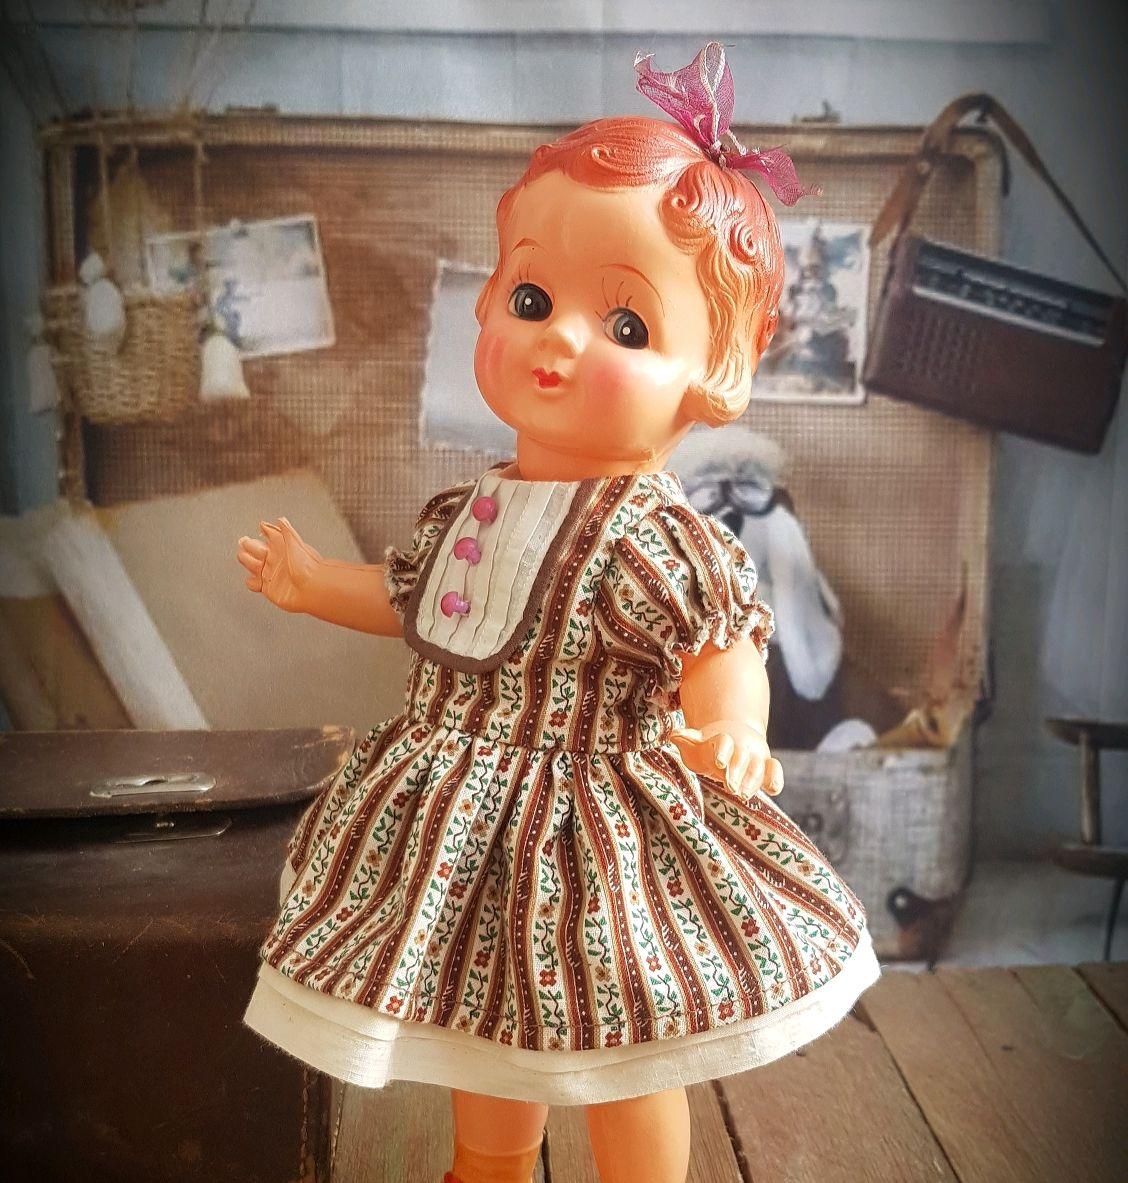 Винтаж: Антикварная целлулоидная кукла Женечка, Куклы винтажные, Уфа,  Фото №1